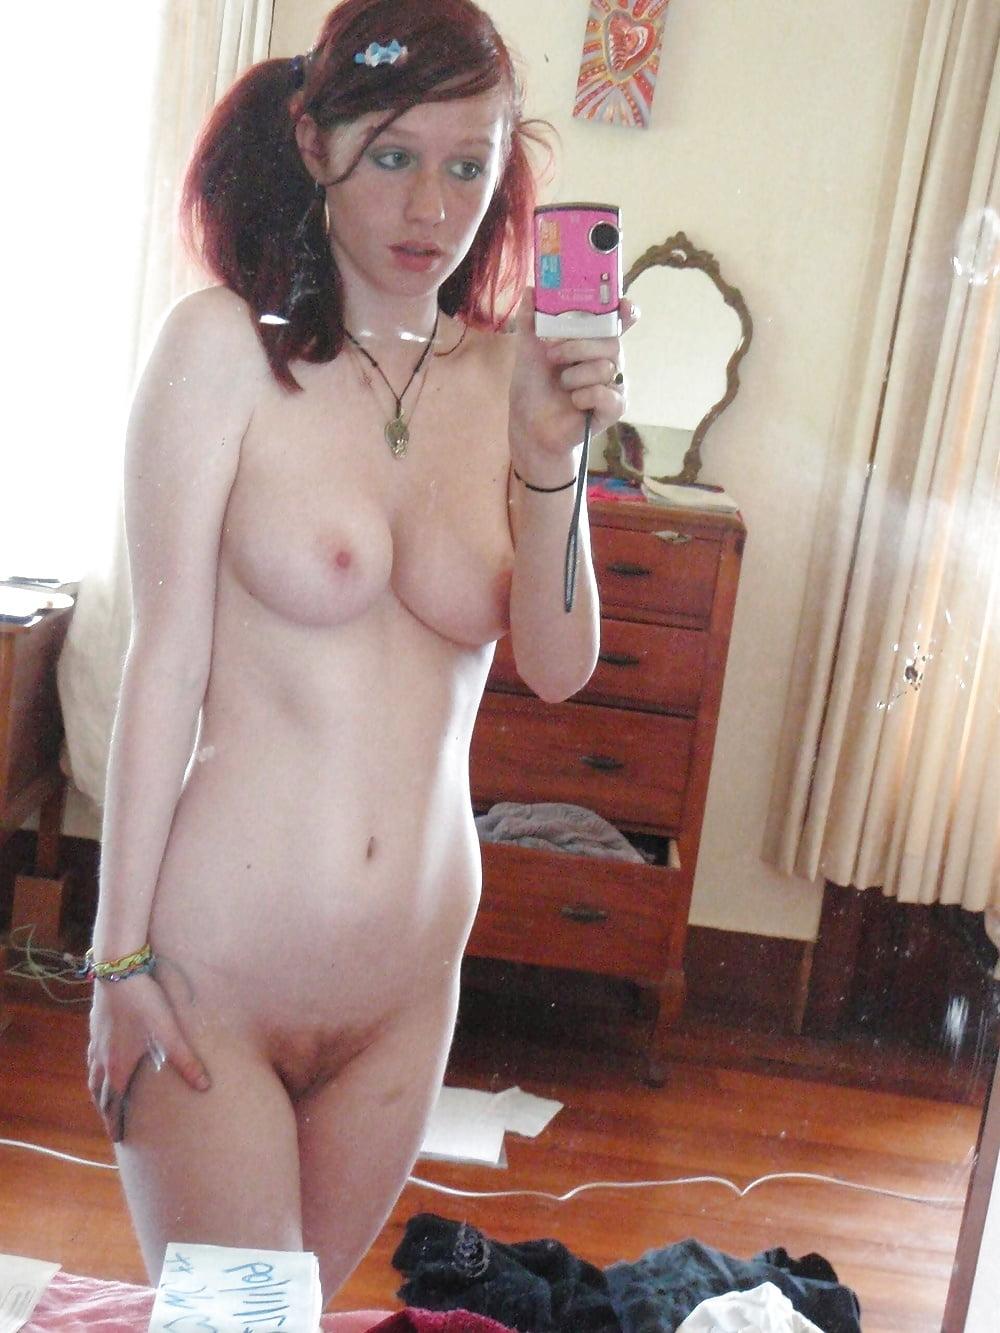 mallu-ex-girlfriend-sexting-nude-sexy